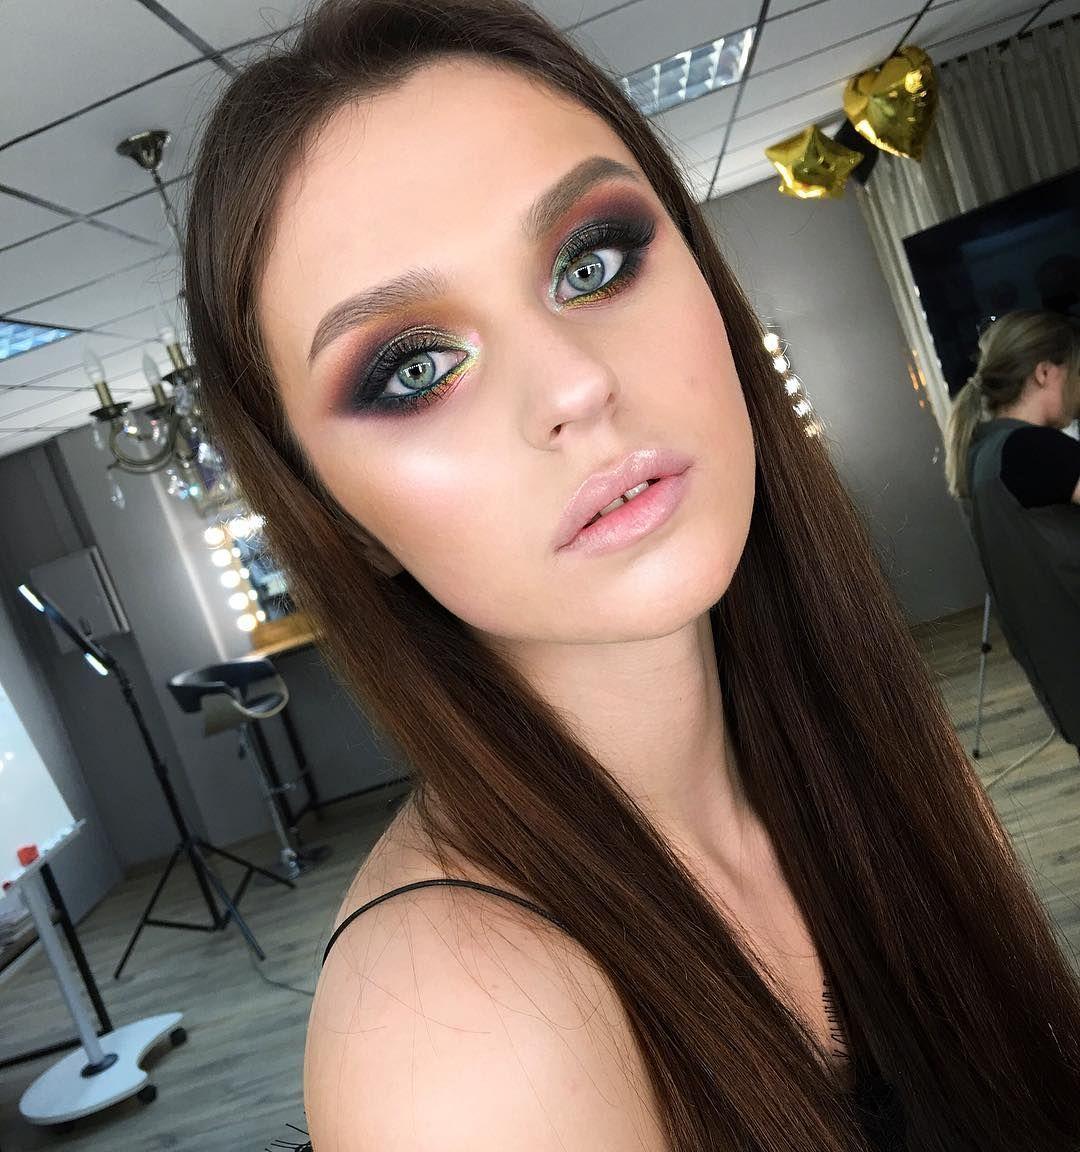 Tani Models In 2019: 5,511 Curtidas, 56 Comentários